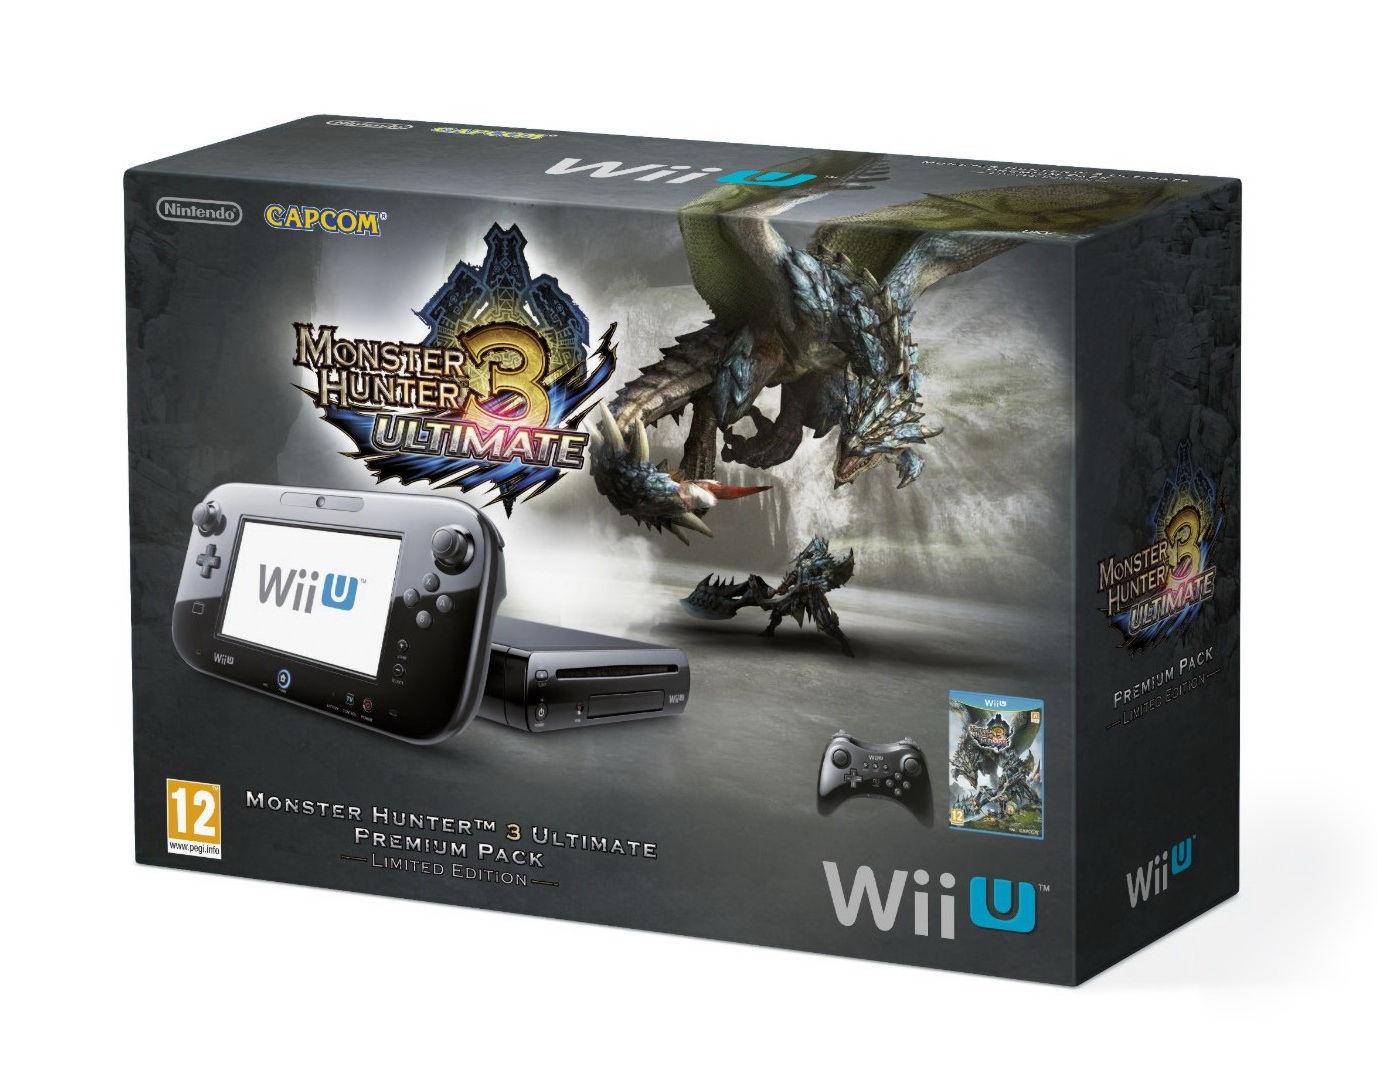 Nintendo Wii U Premium Pack + игра Monster Hunter 3 Ultimate (NIC-2300436)